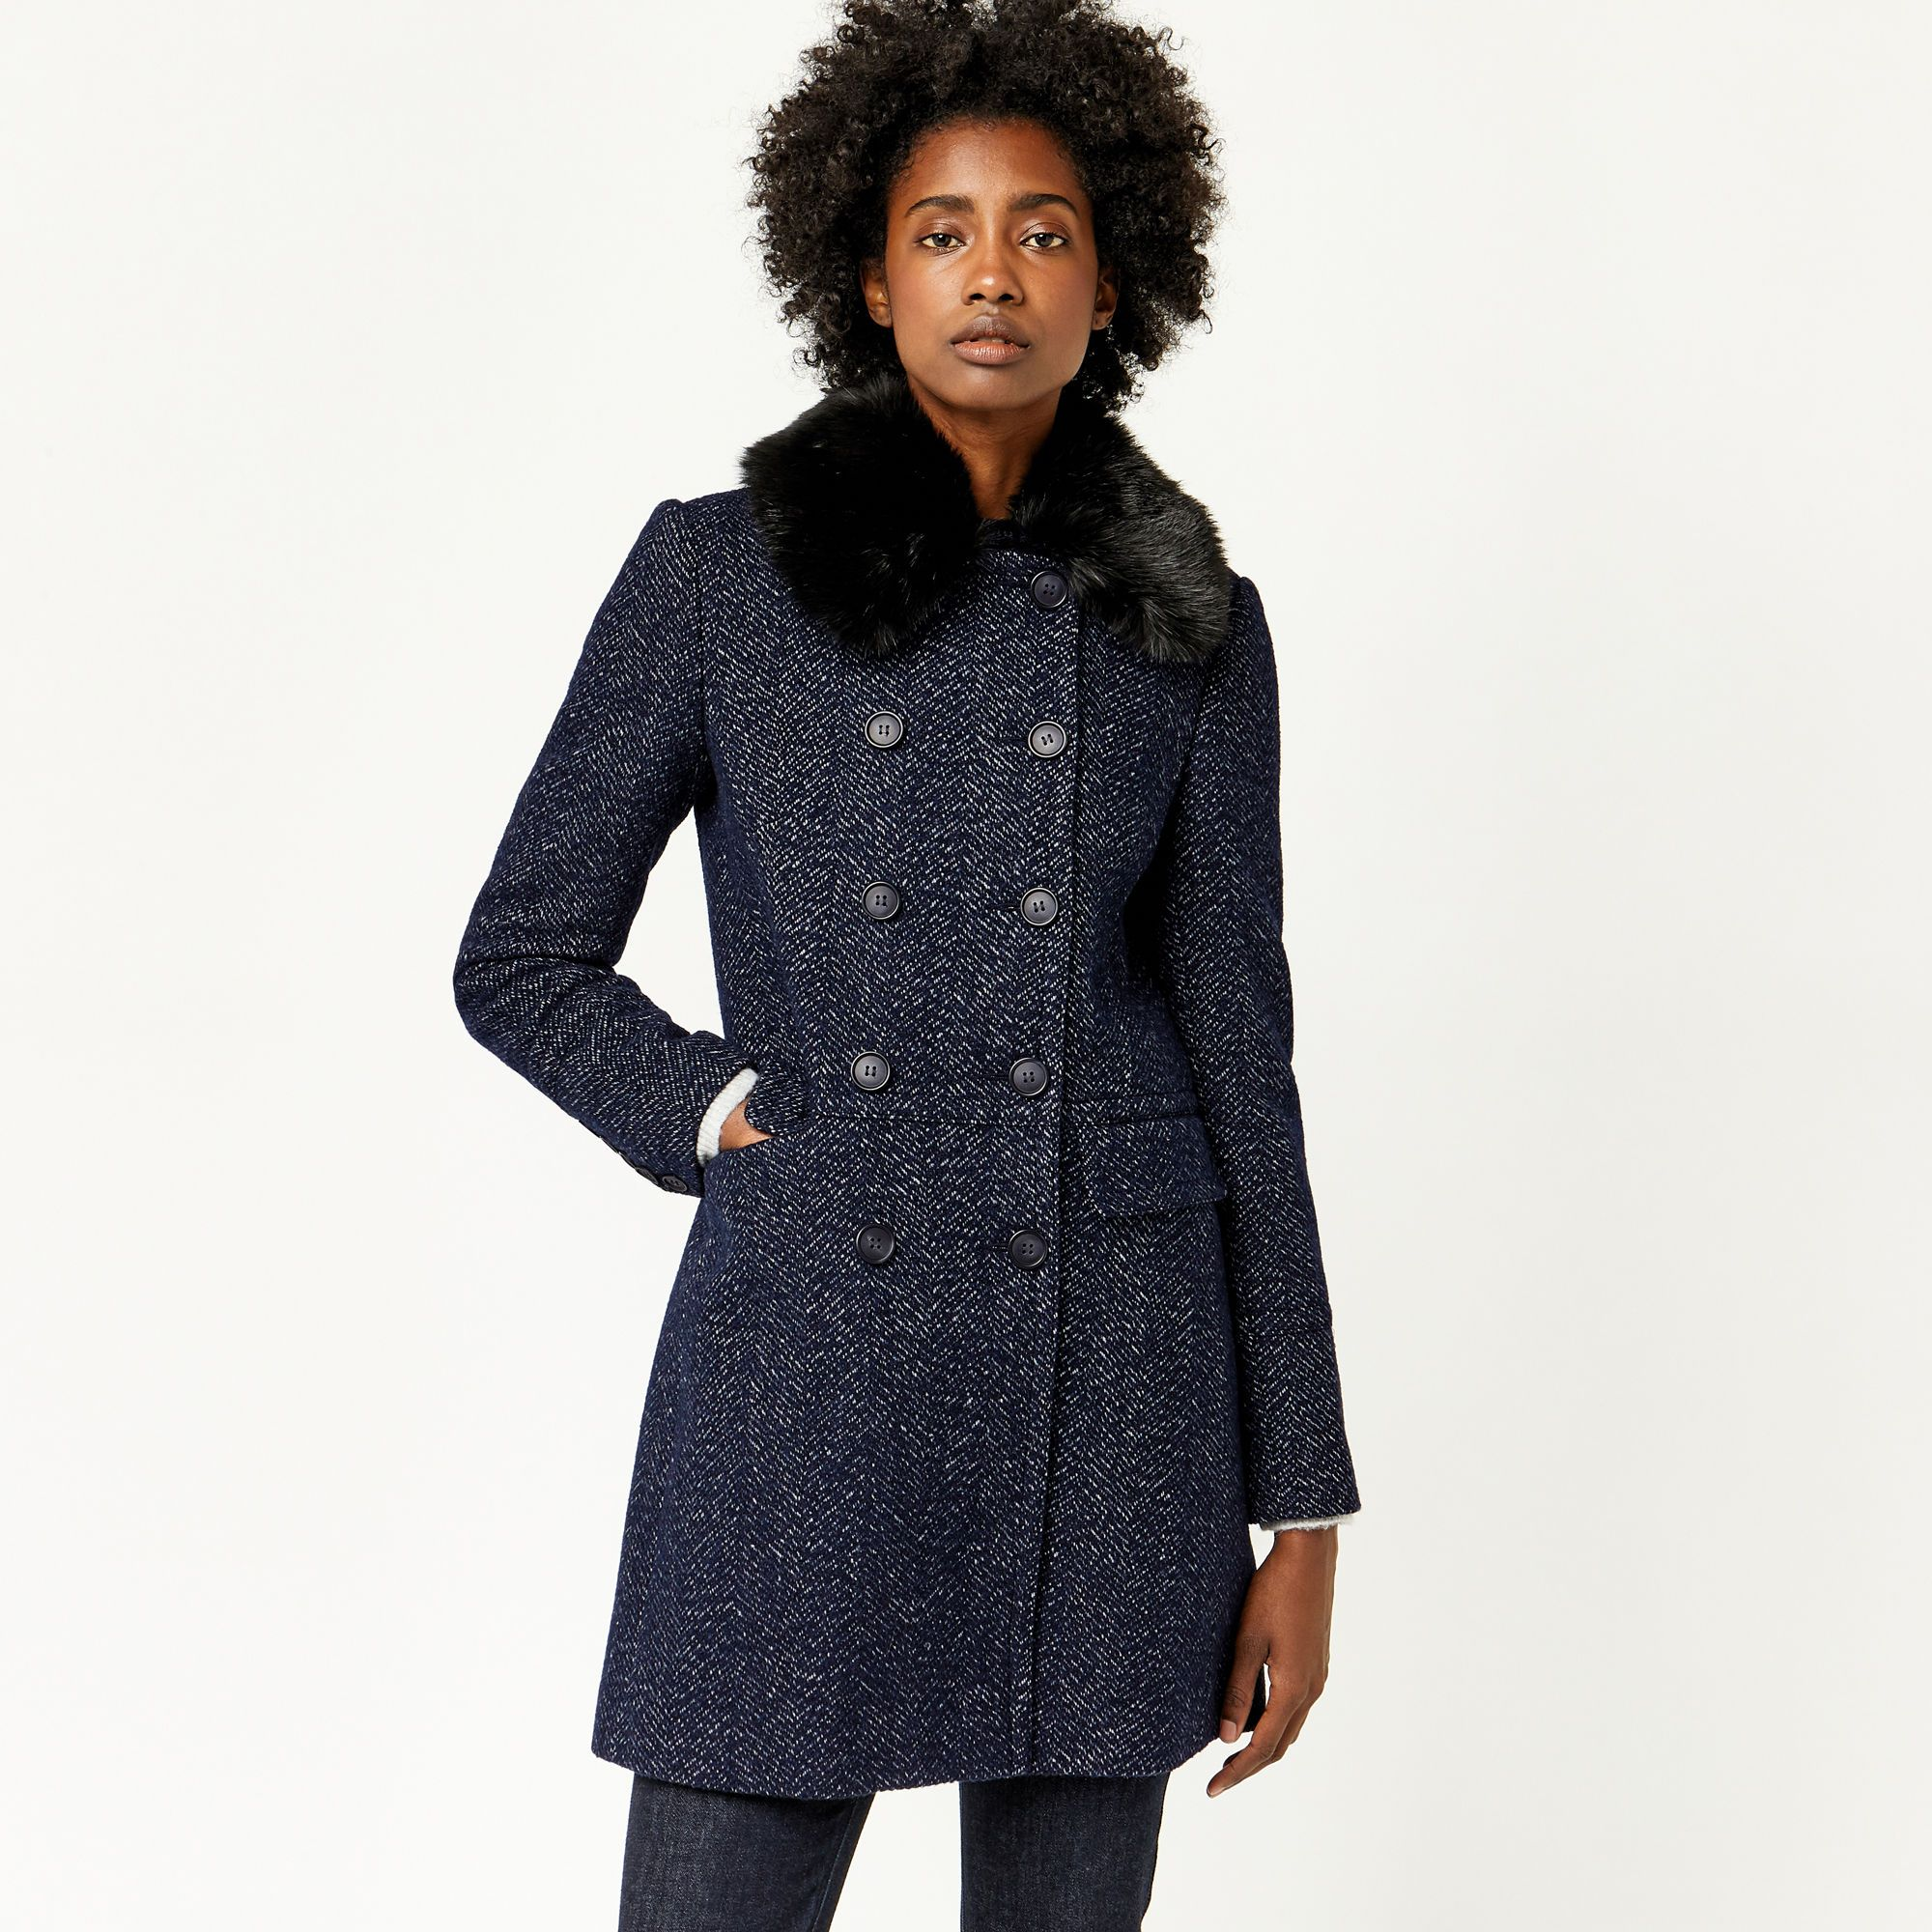 Warehouse, Swing Faux Fur Collar Coat Navy 1 | 2017 | Pinterest ...